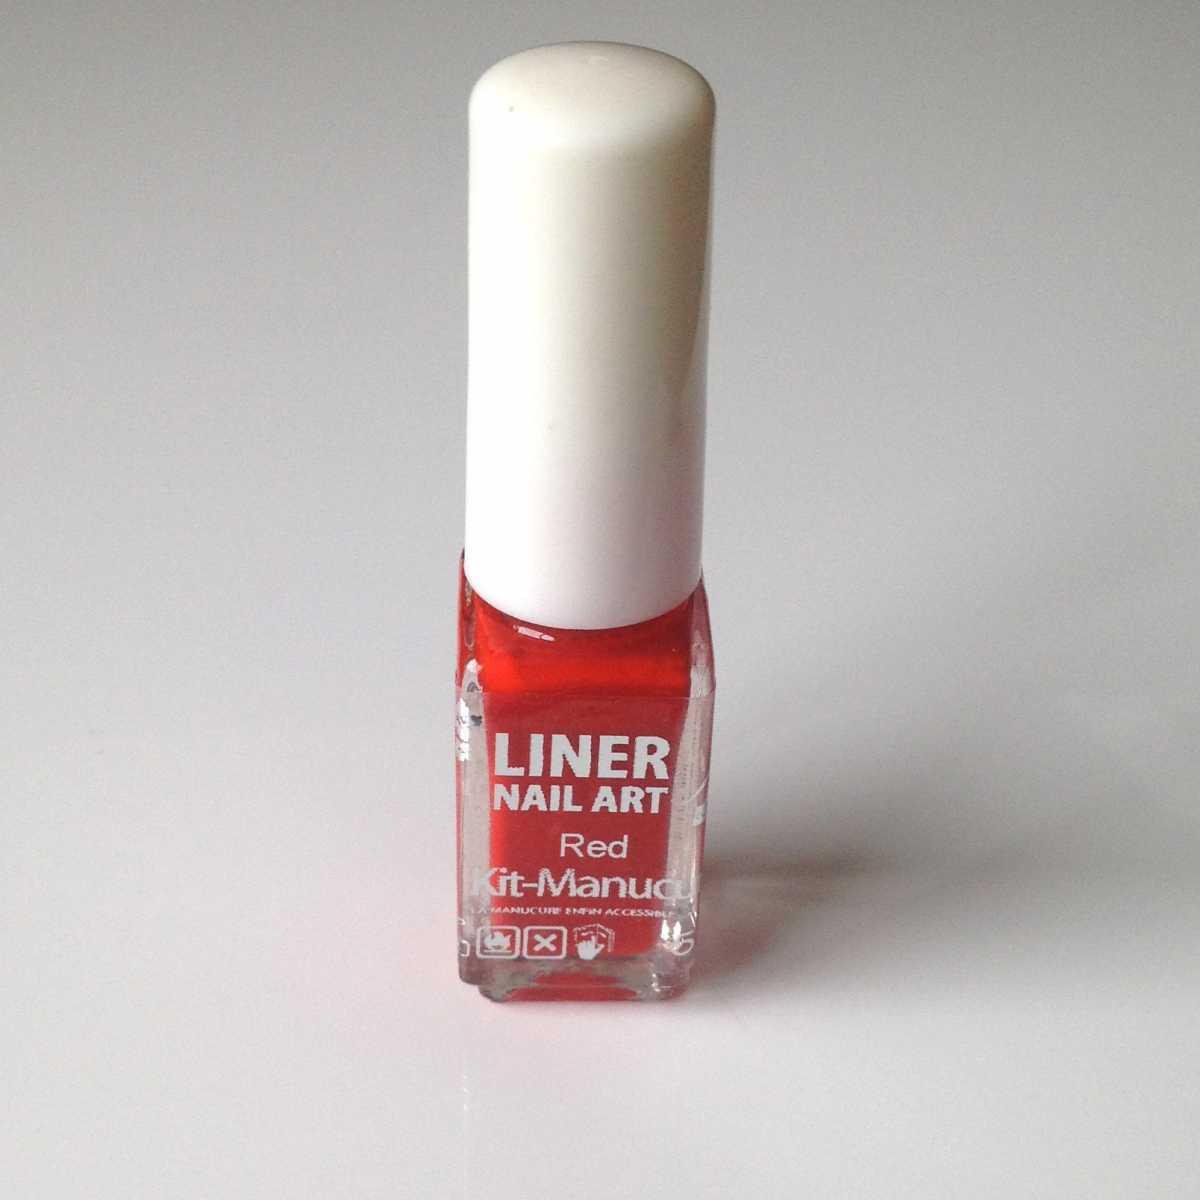 https://www.kit-manucure.com/667-thickbox_default/liner-nail-art-rouge.jpg